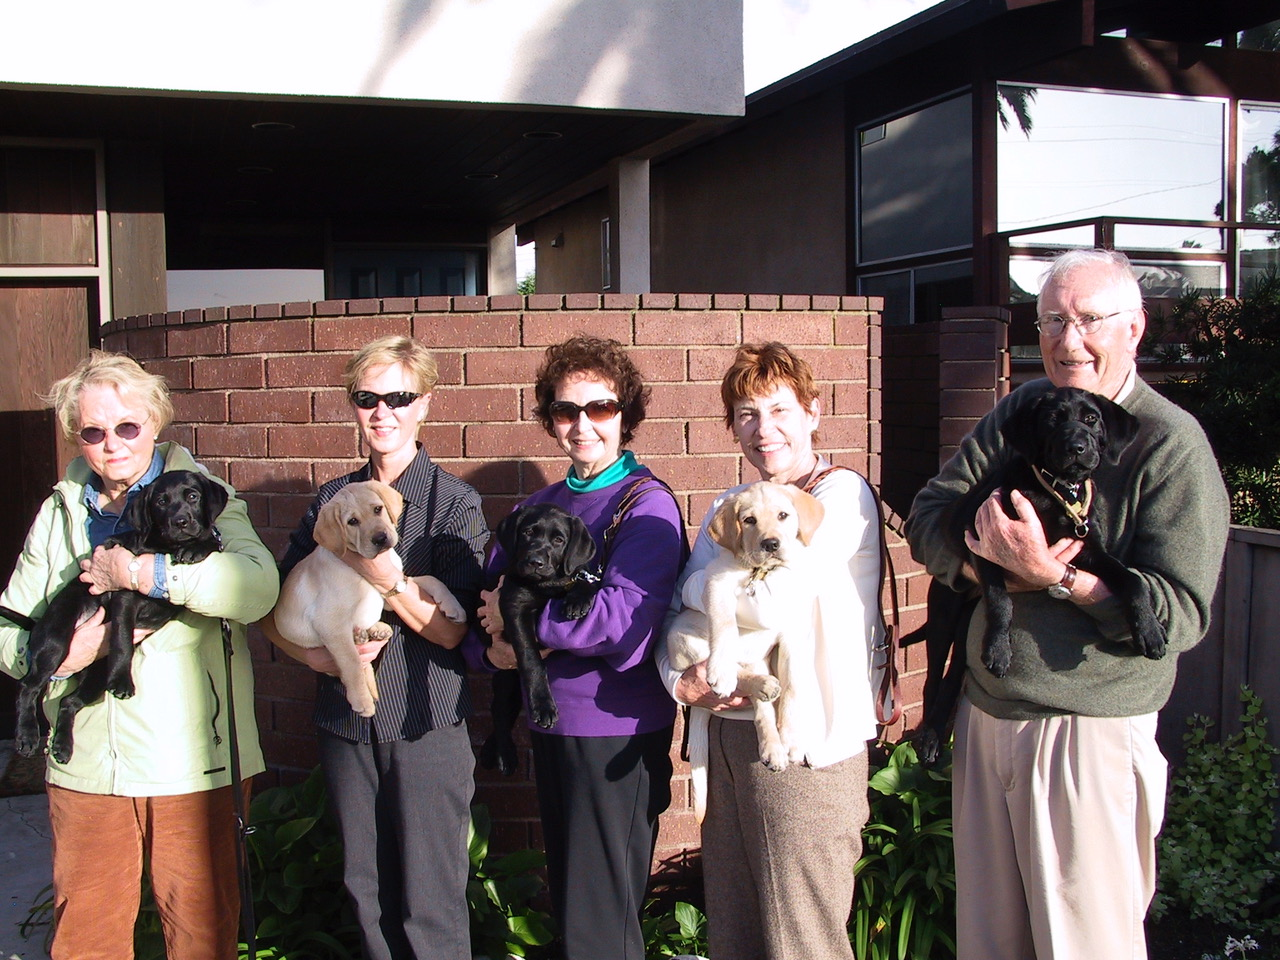 5 Niles pups: Judy w/ Tuck; Gail w/ Beverly; Pat w/ Tola; Joan w/ Butch; Bill w/ Hark